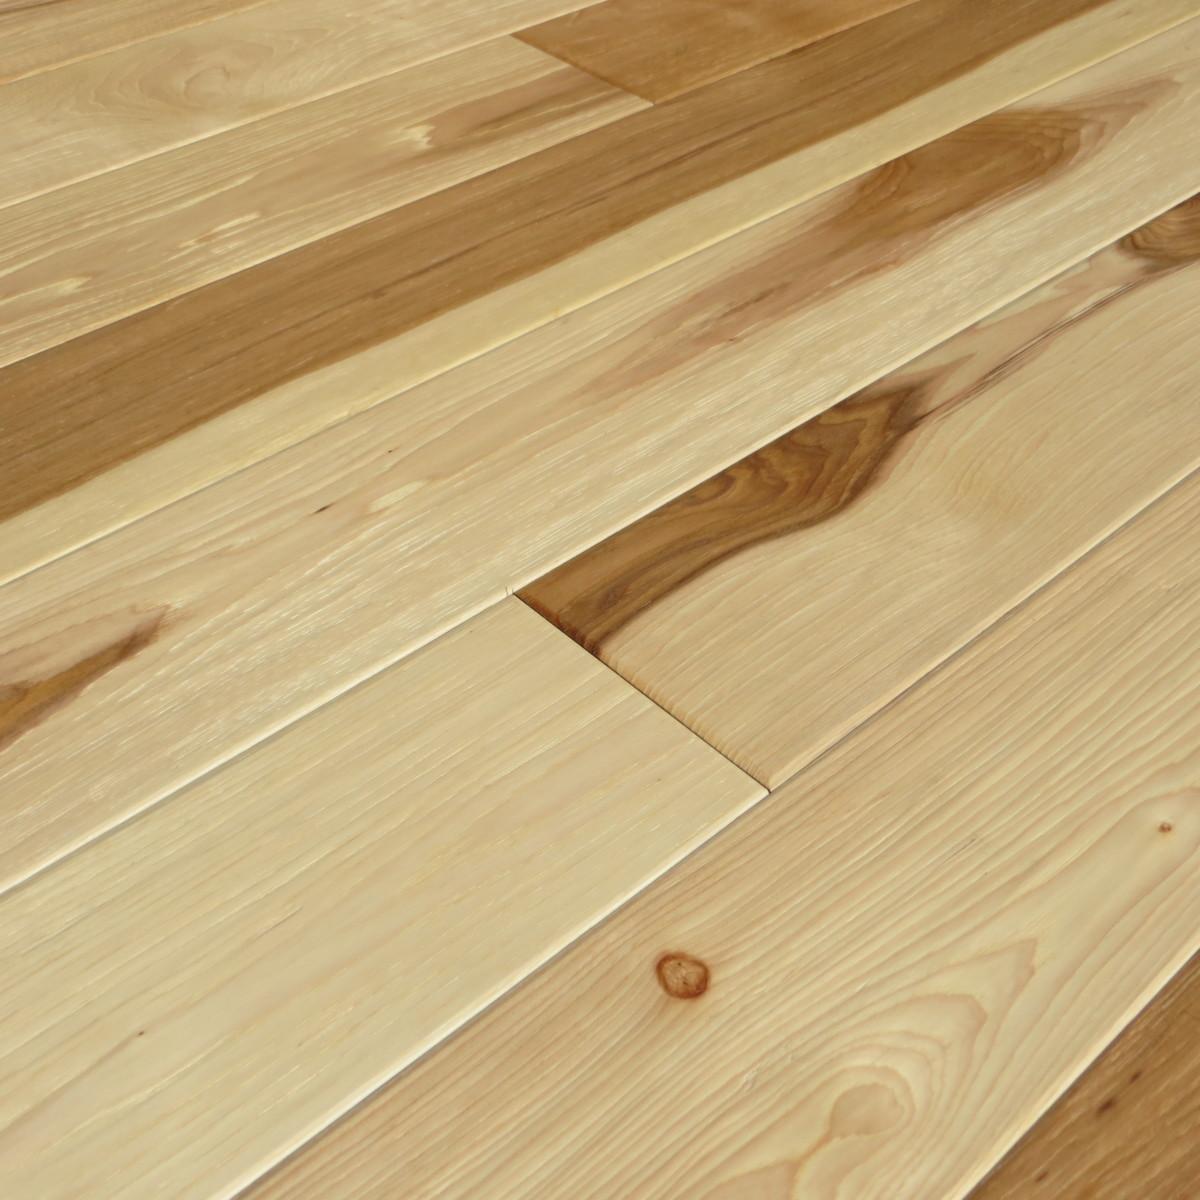 hickory hardwood flooring millennium hickory oiled hand scraped thumb hardwood flooring GNHWVSP